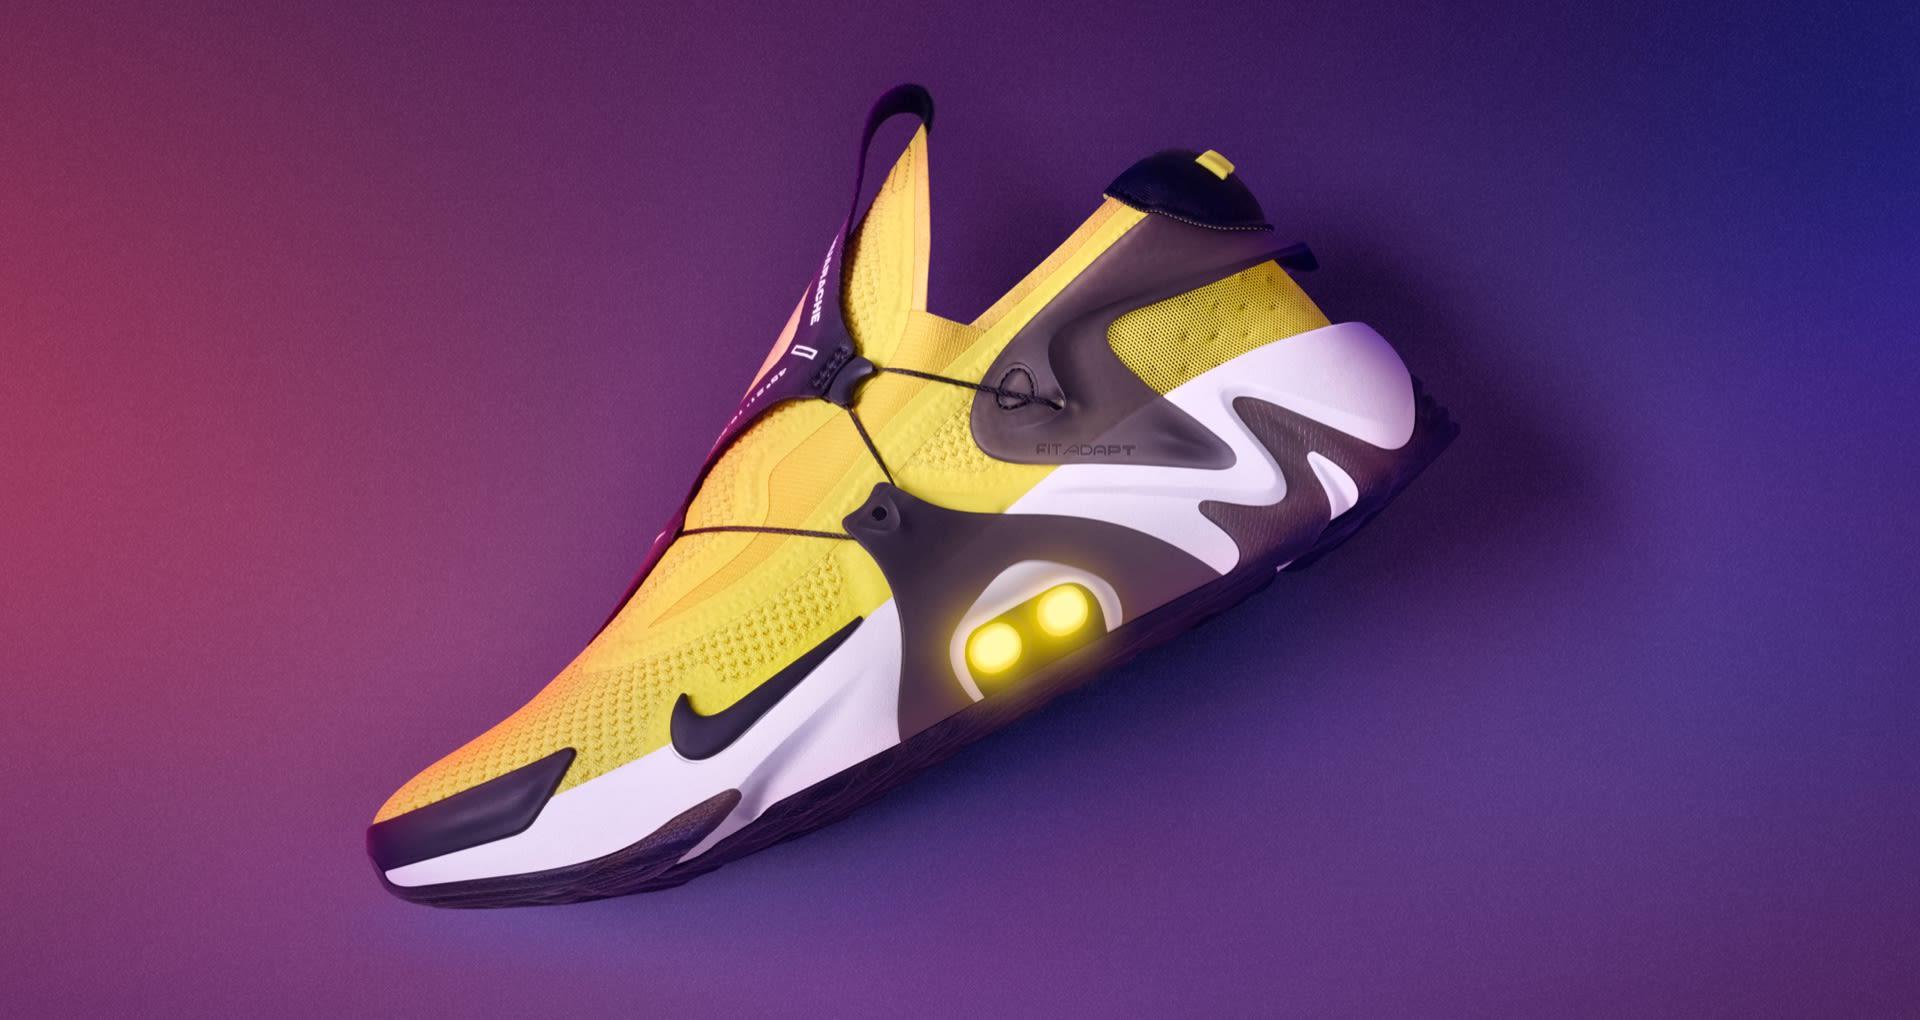 The Future-Fitted Nike Adapt Huarache